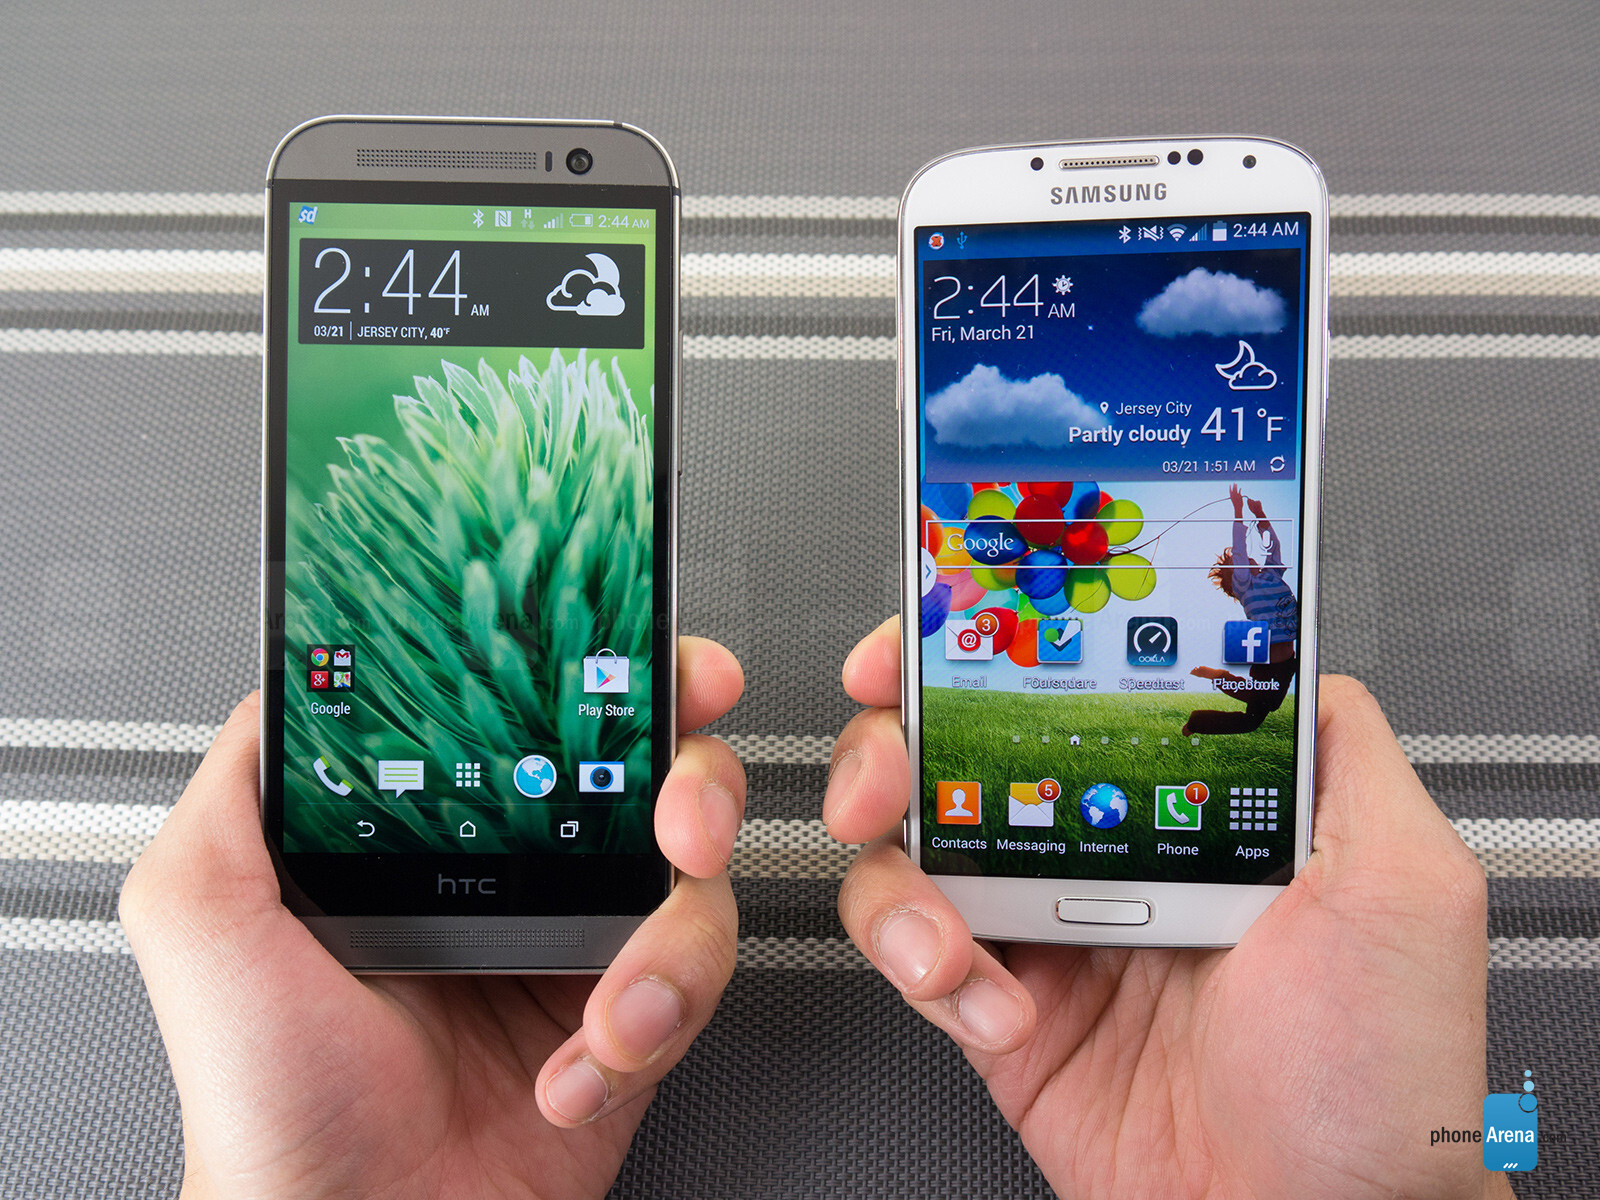 Htc One m8 vs Samsung Galaxy